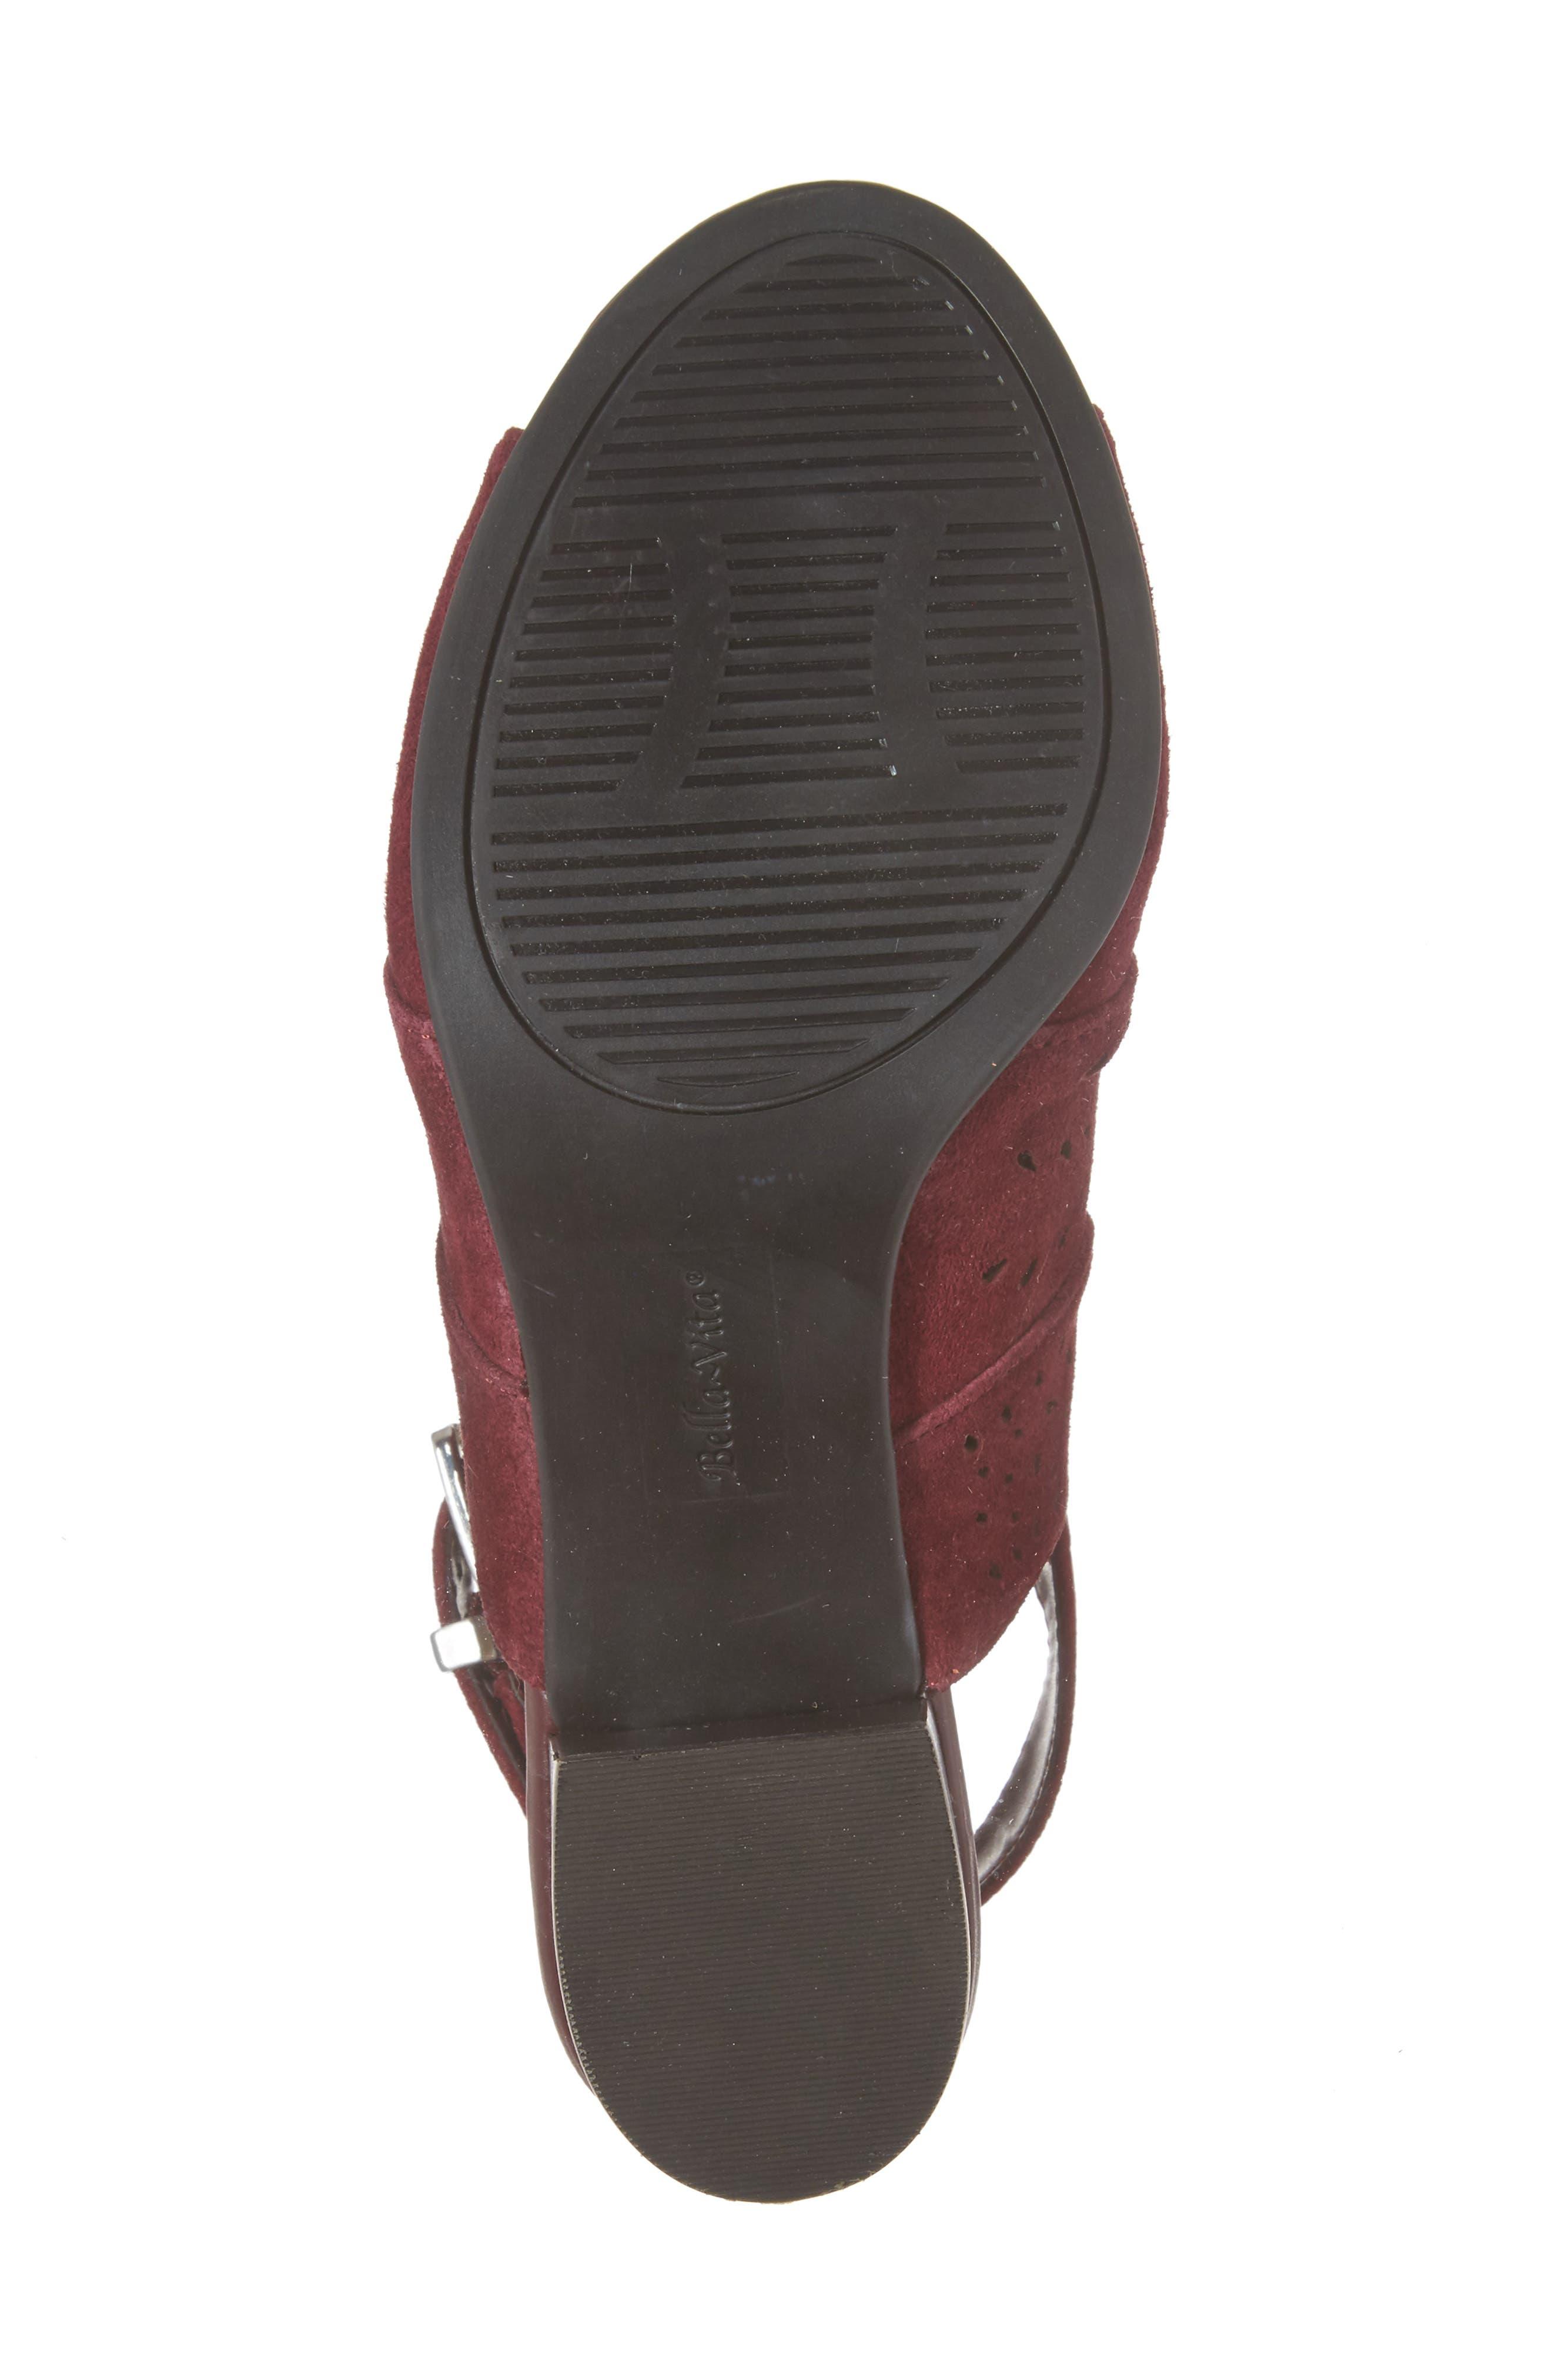 Fonda Perforated Sandal,                             Alternate thumbnail 6, color,                             930